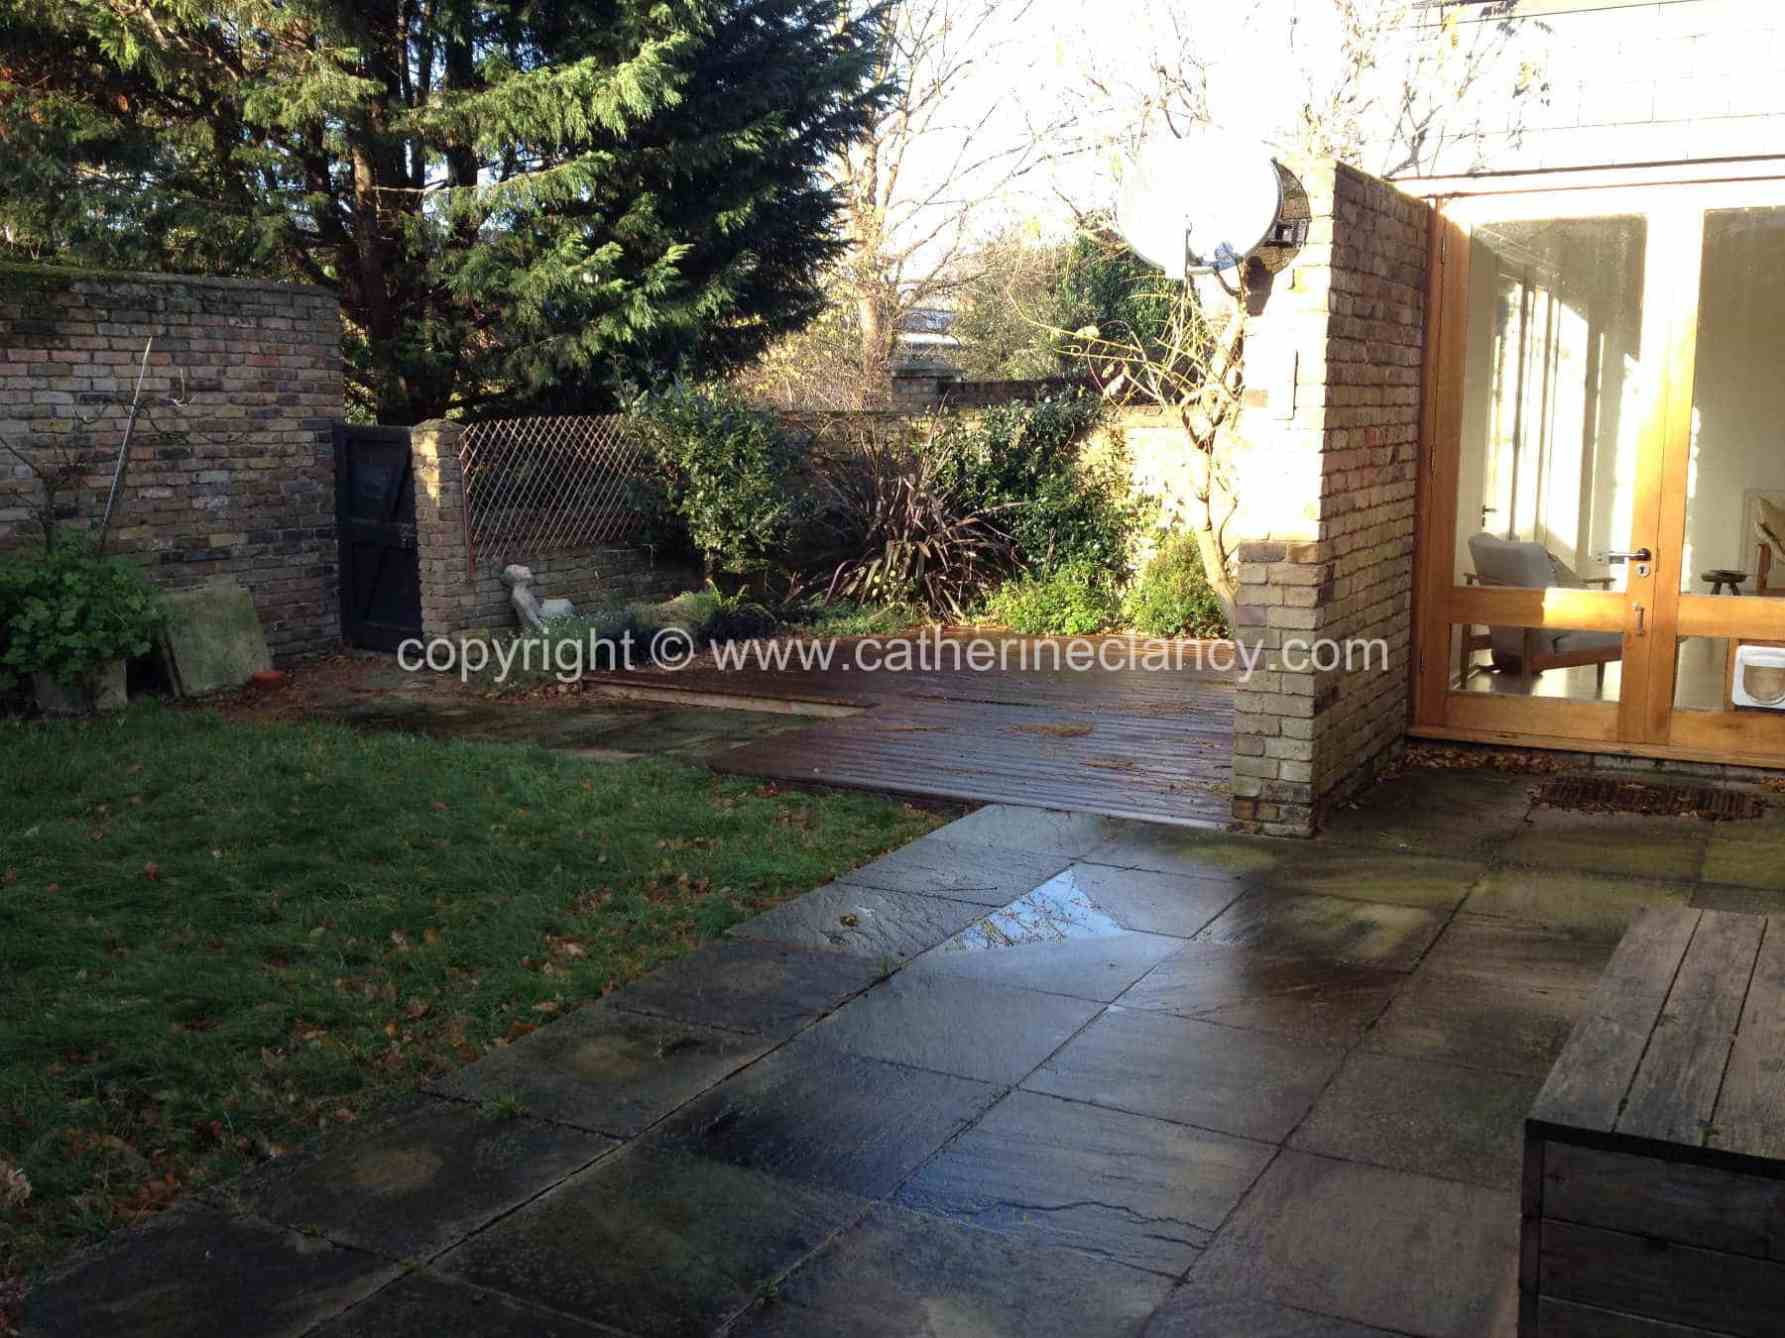 blackheath-courtyard-11